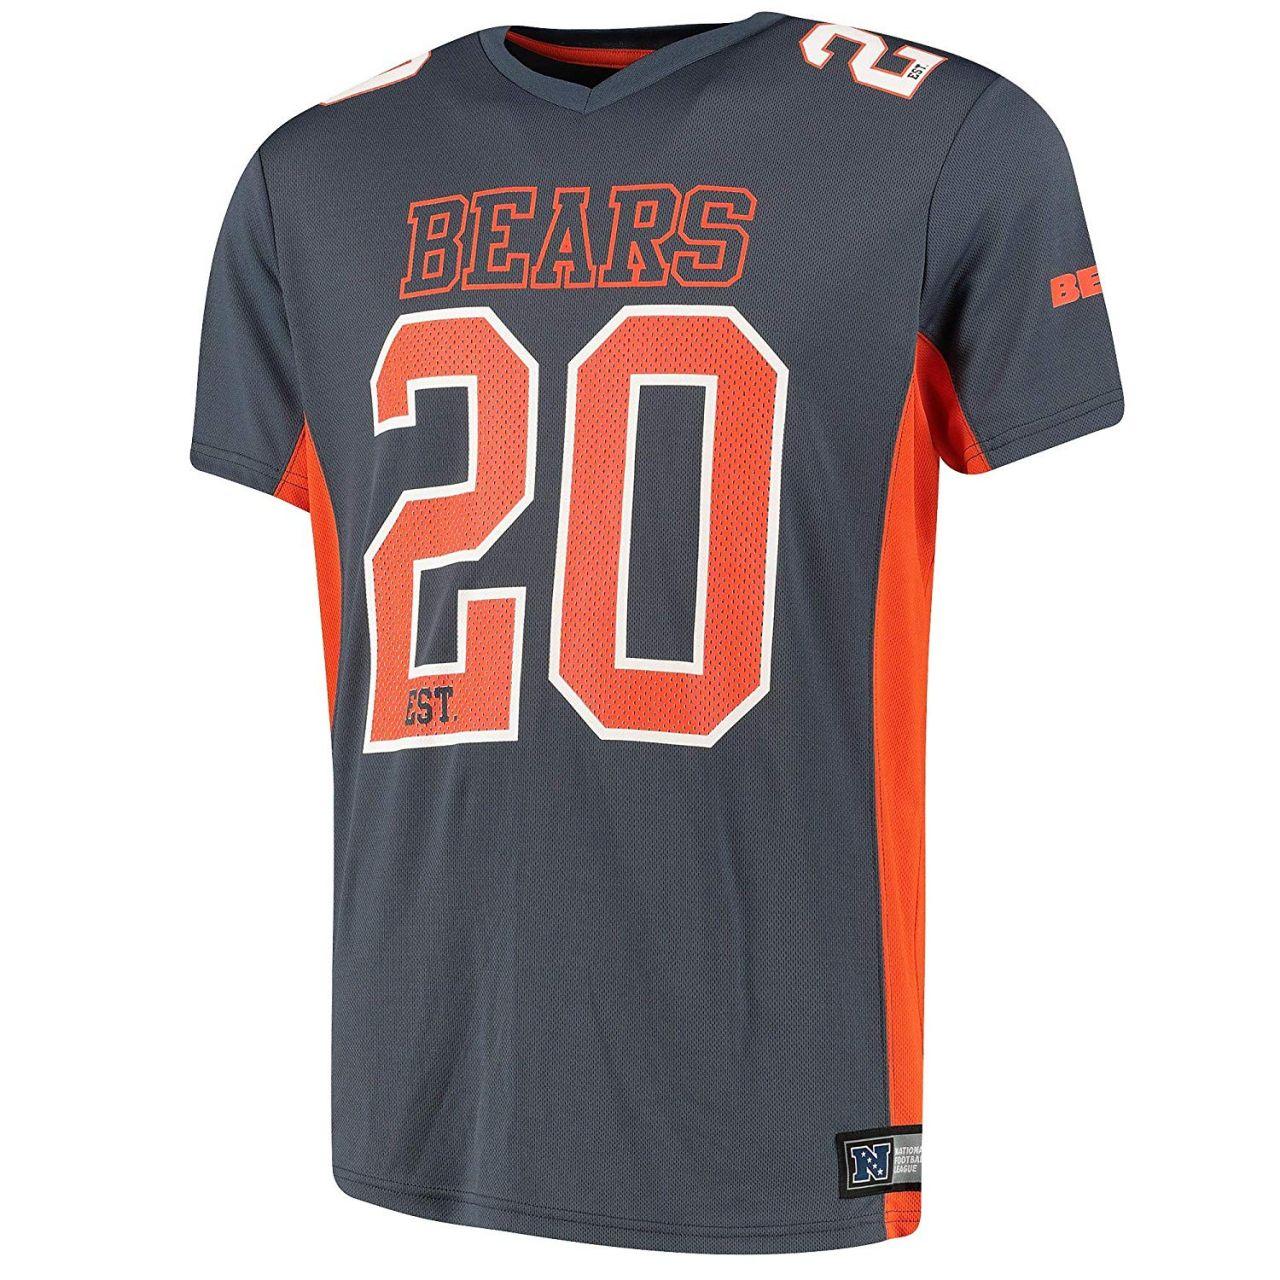 amfoo - Majestic NFL MORO Polymesh Jersey Shirt - Chicago Bears